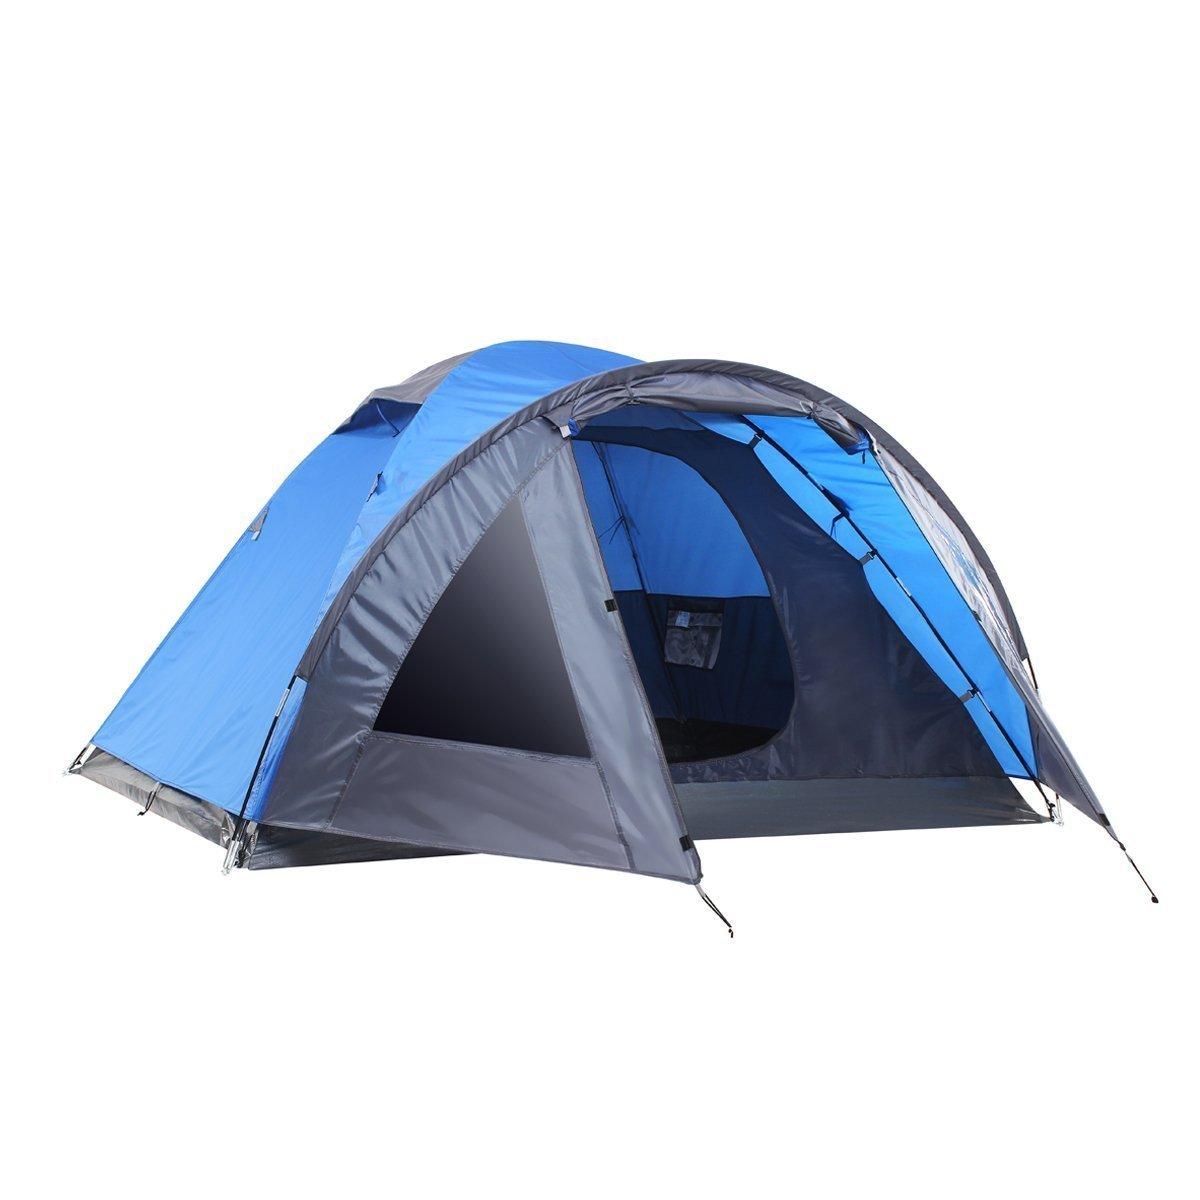 sEMOoダブルレイヤ、3 – 4人、3-season軽量キャンプ/旅行テントwith Carryバッグ  ブルー B06XCMHNPS